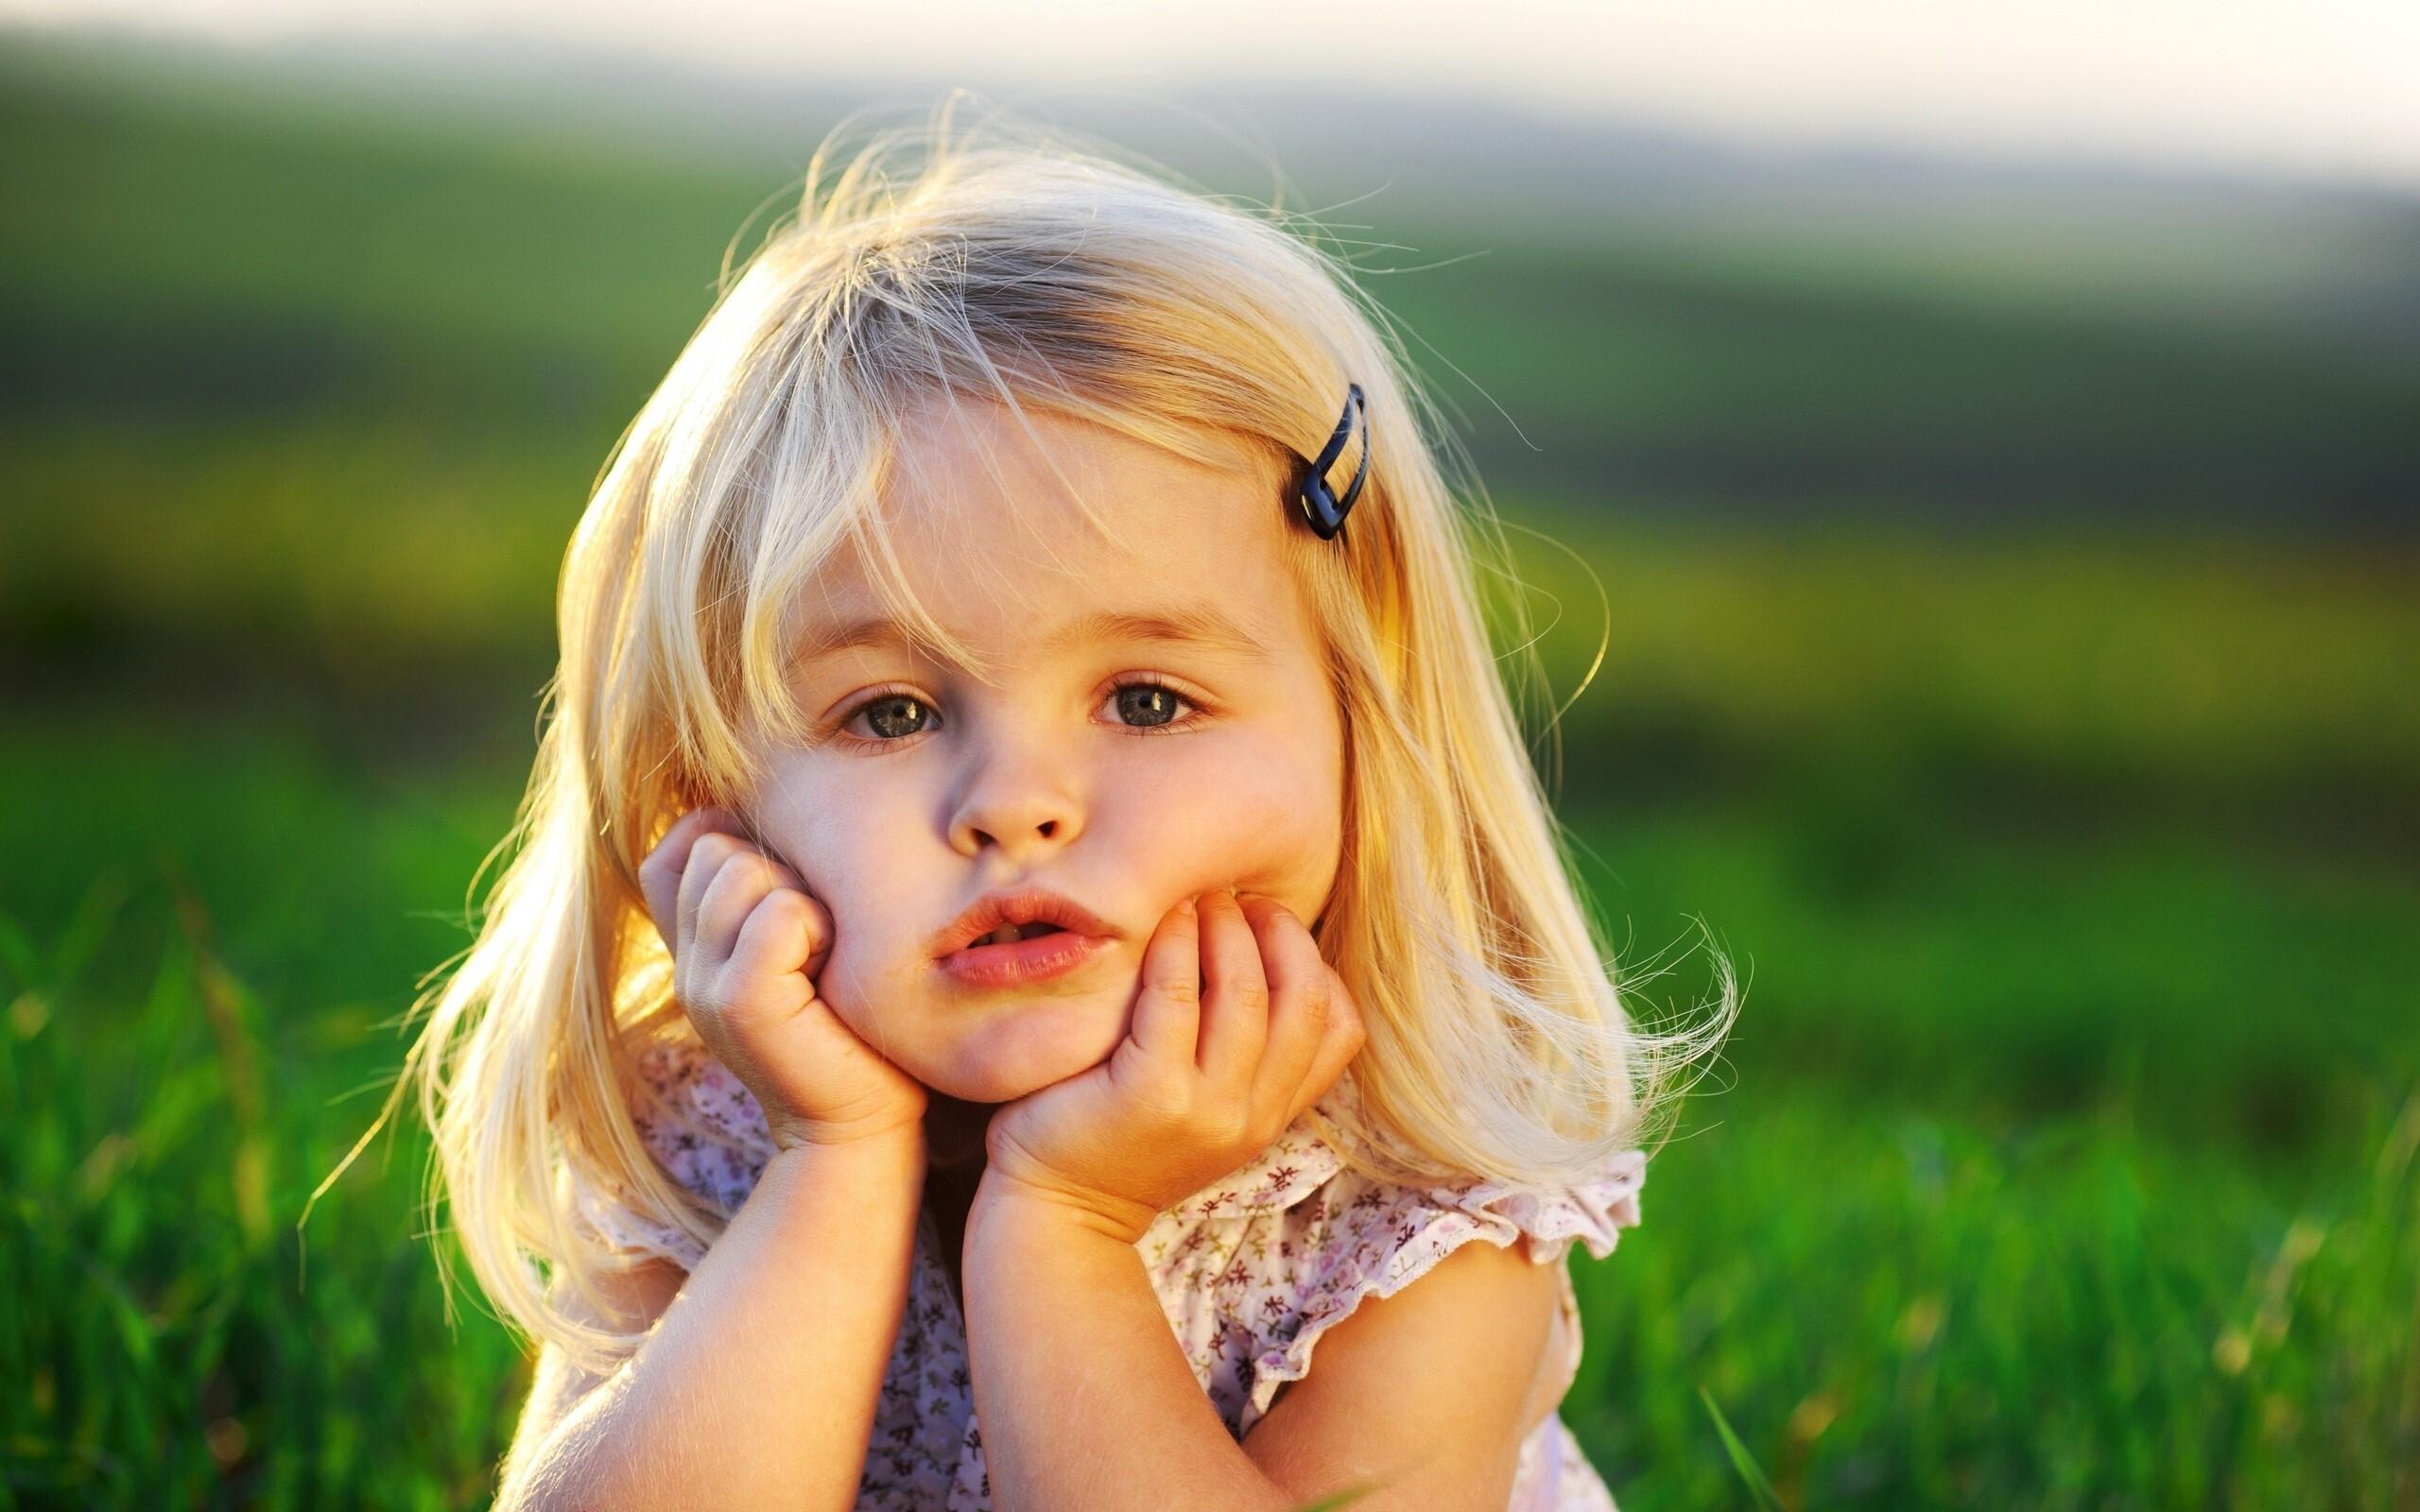 Cute baby girl hd wallpaper hd wallpapers cute baby girl hd wallpaper download voltagebd Gallery